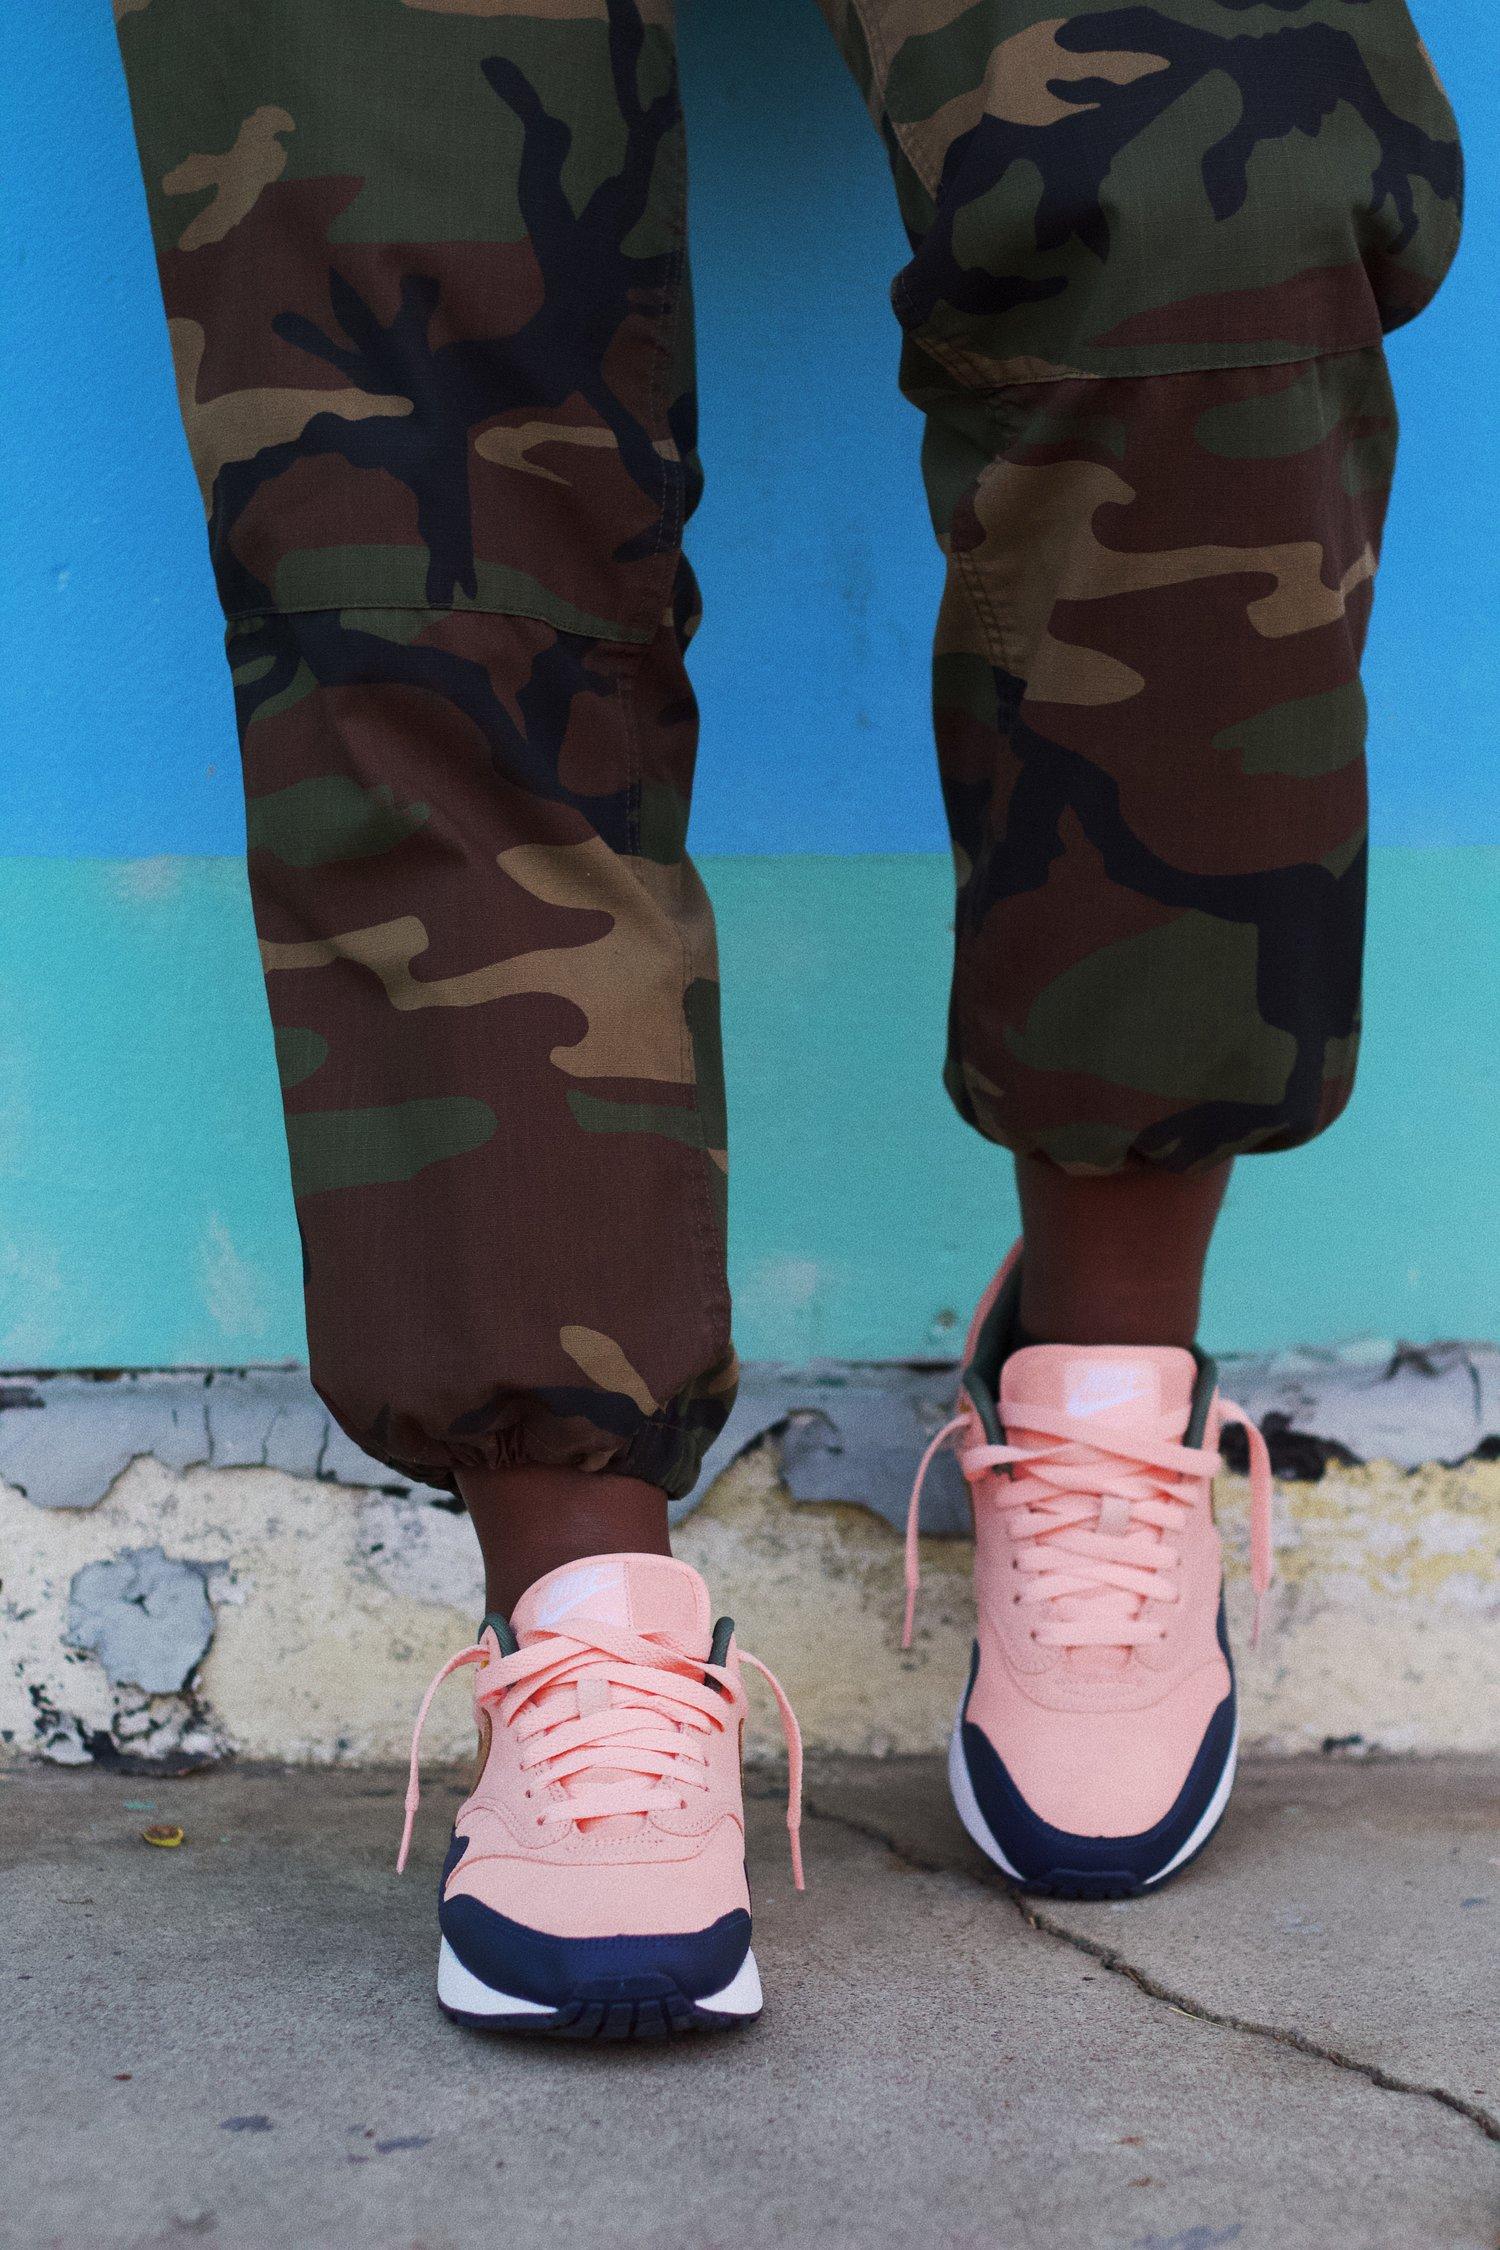 Renacimiento Persuasivo Médula ósea  4 Nike By You x Cultivator Designers You Want To Know — CNK Daily  (ChicksNKicks)